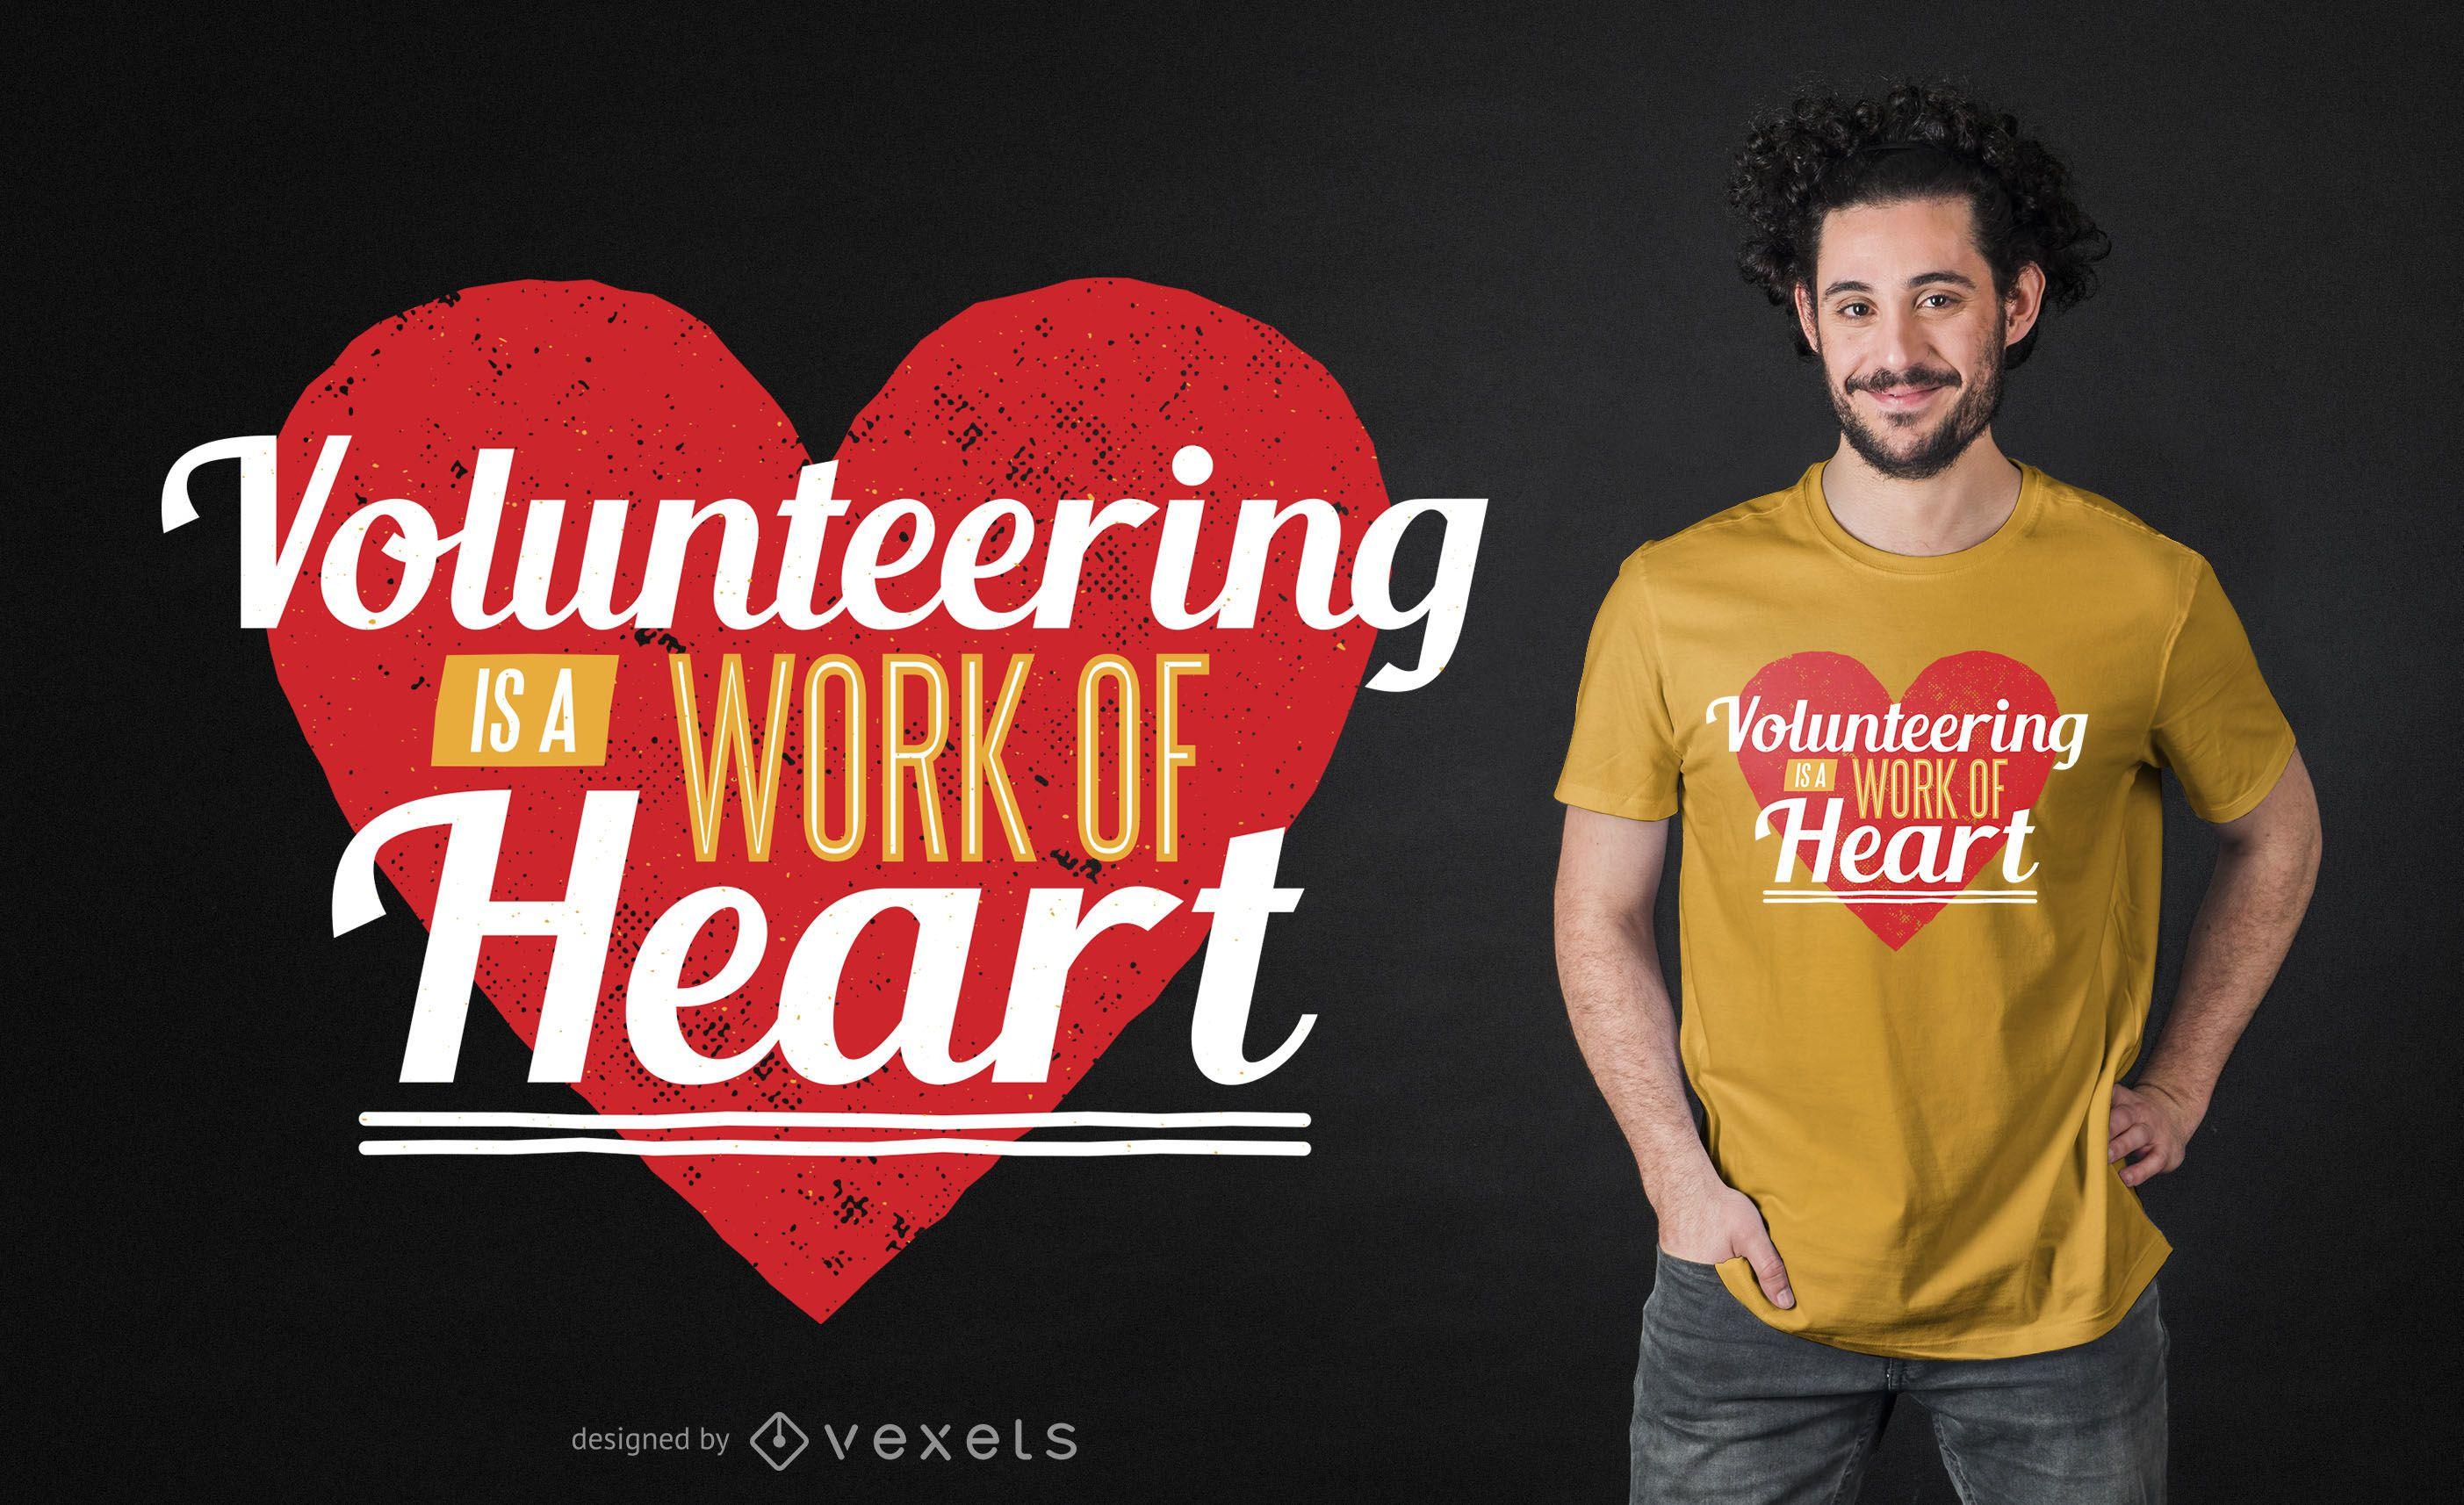 Volunteering heart t-shirt design